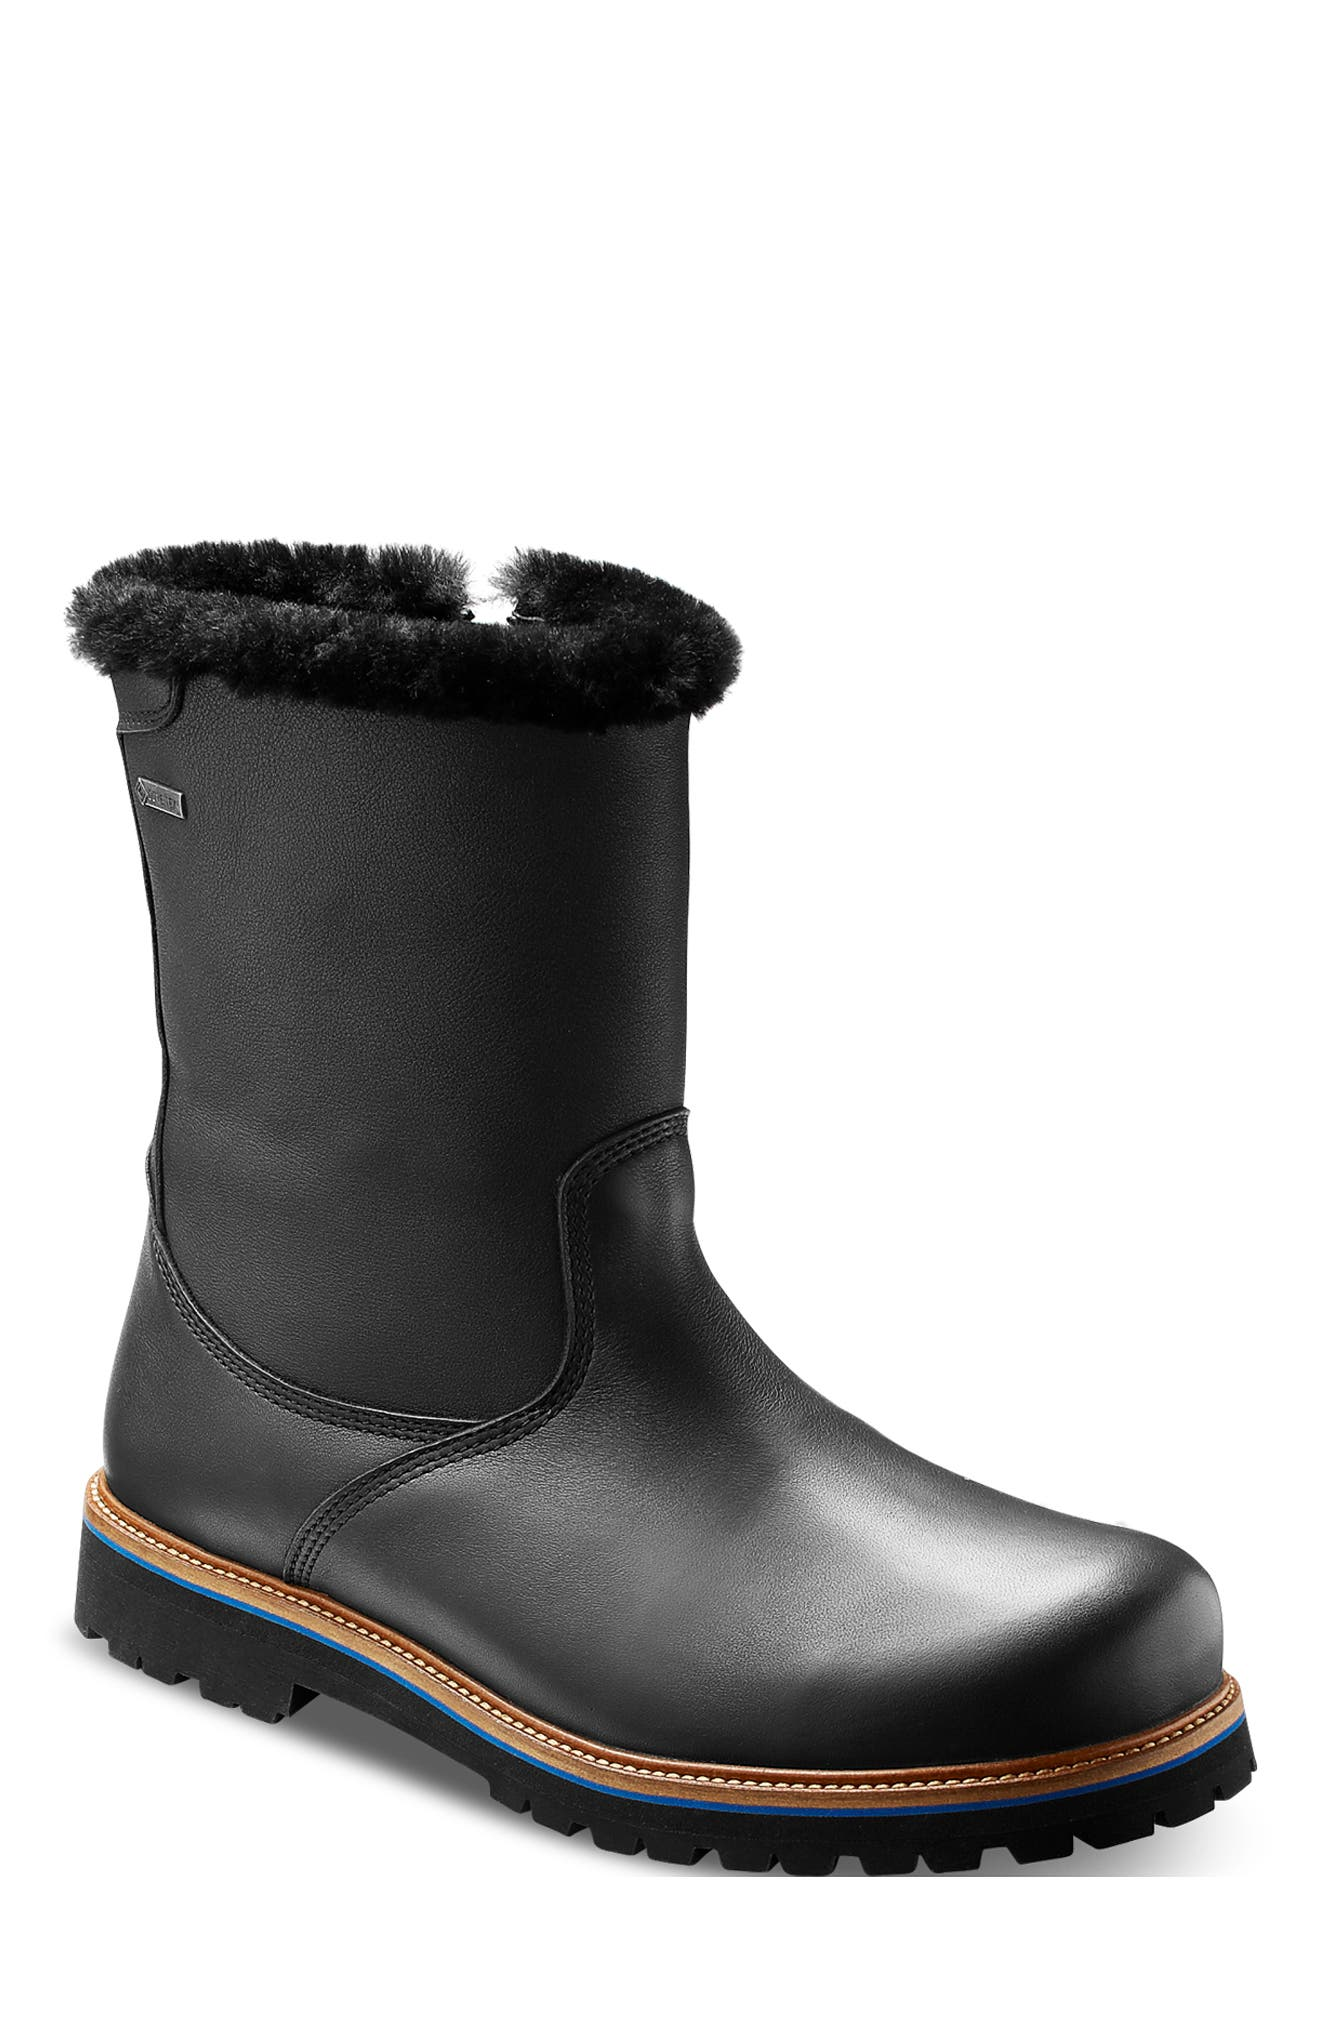 Samuel Hubbard Snow Lodge Waterproof Gore-Tex Genuine Shearling Lined Boot, Black